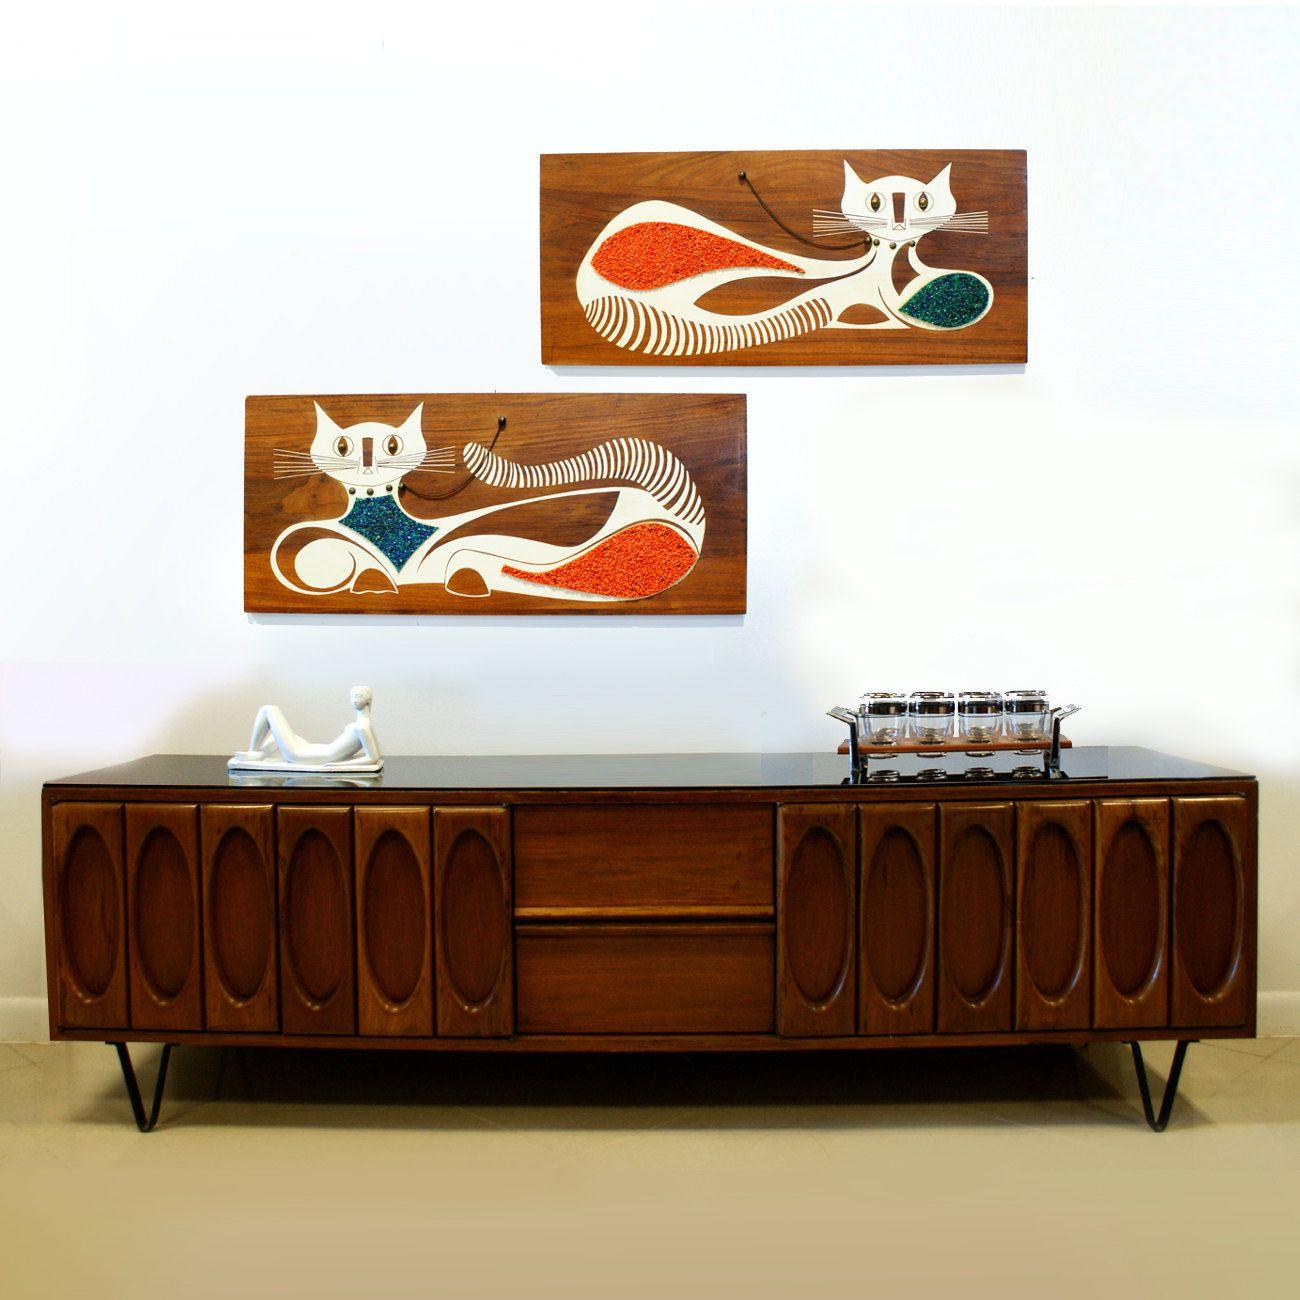 Mid Century Modern Furniture Design: Home Ideas, Furniture, Exterior